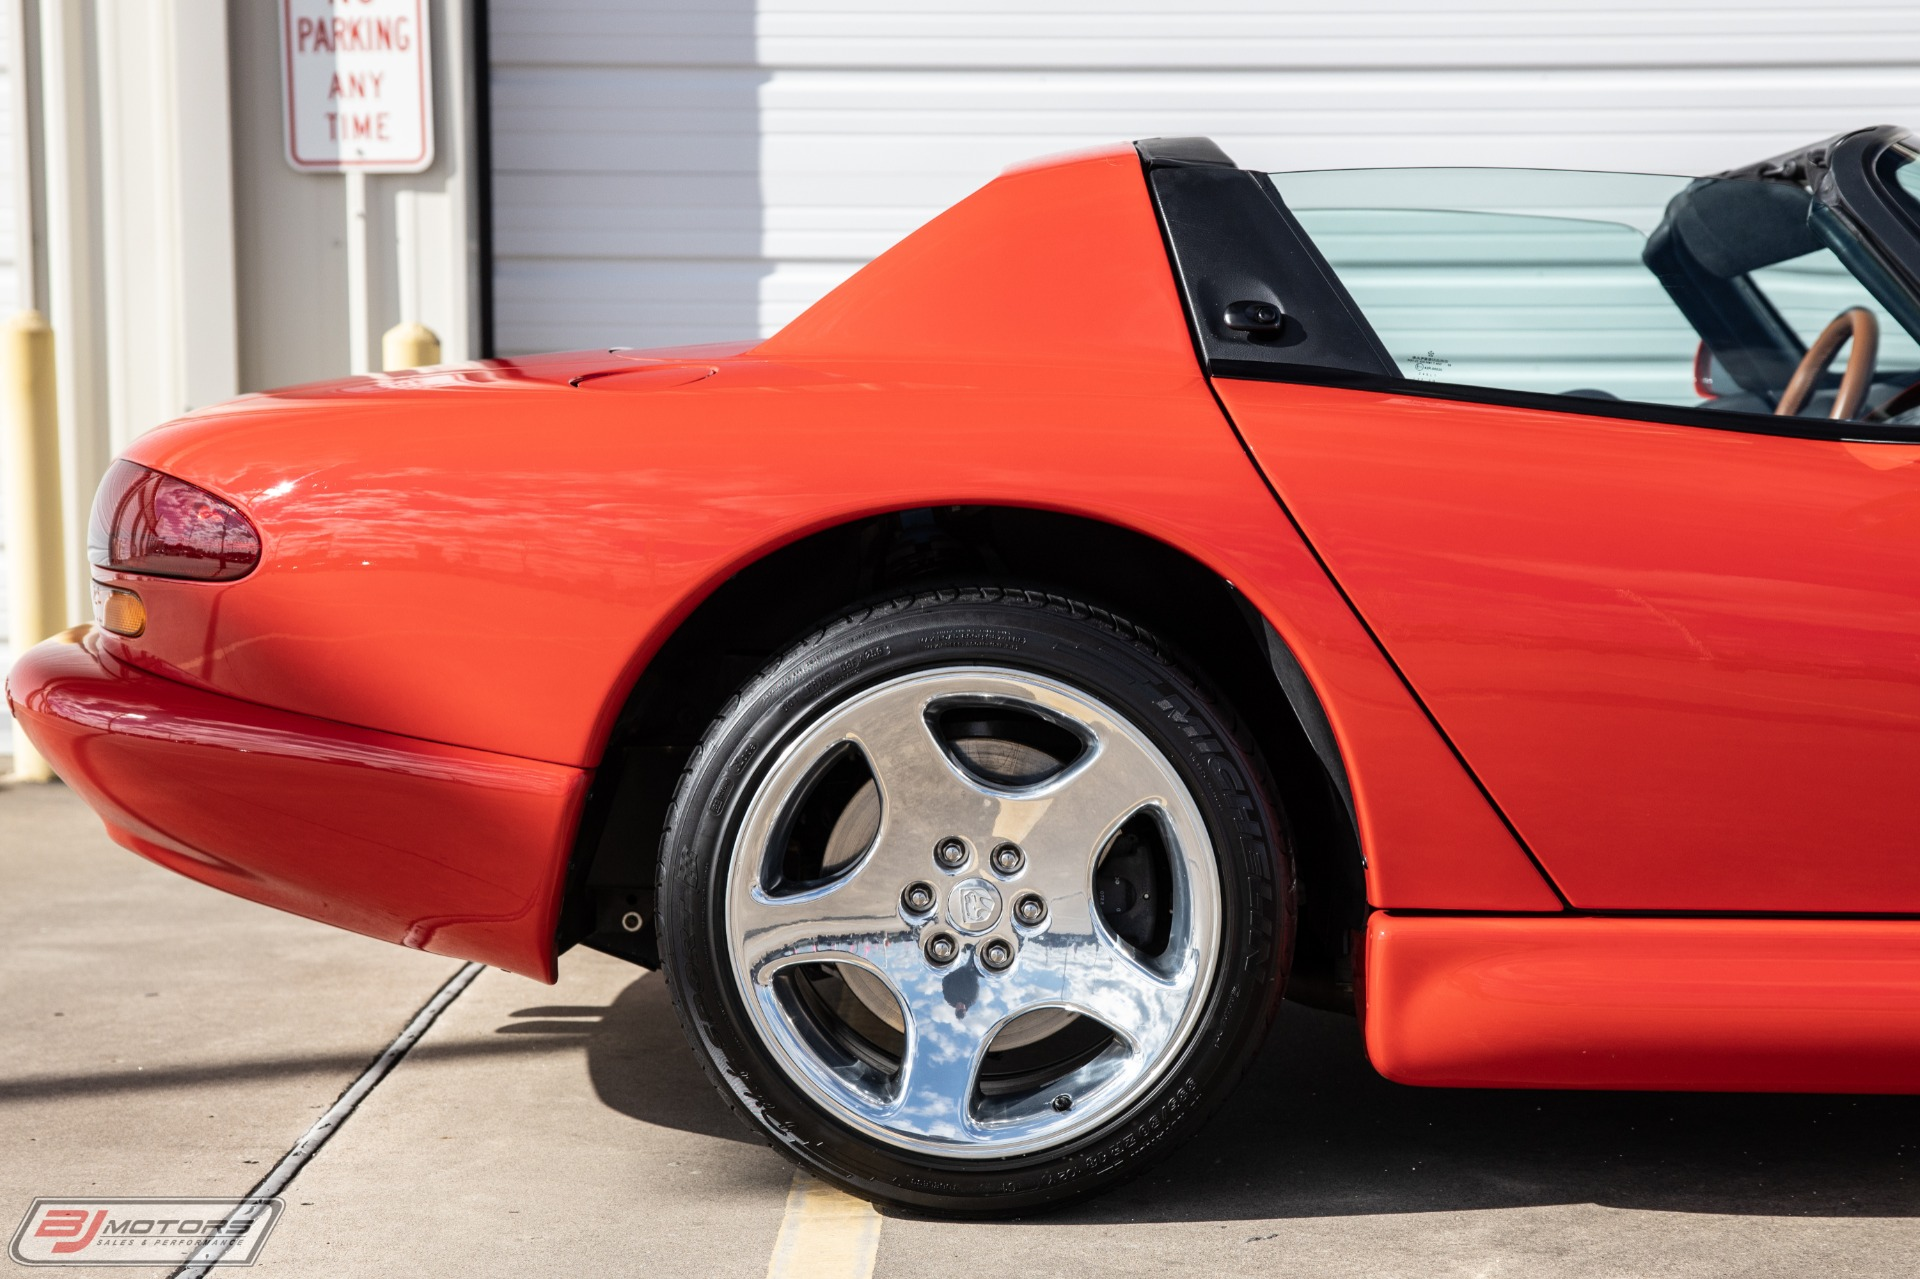 Used-2000-Dodge-Viper-RT/10